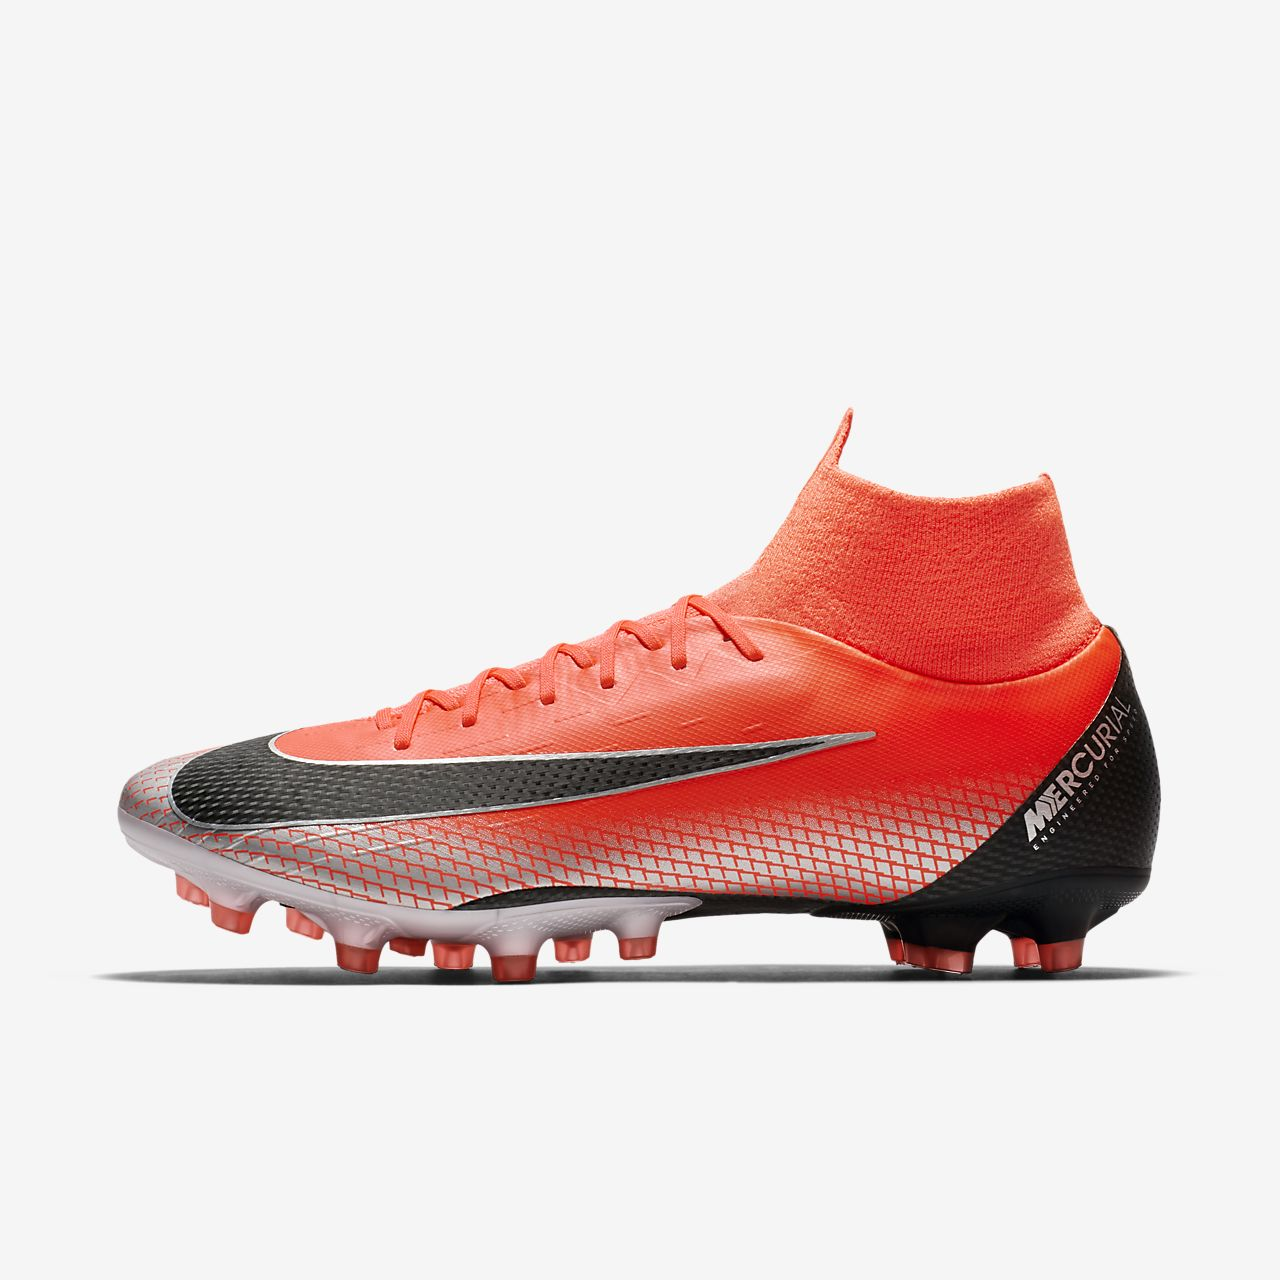 18b13ed15 ... soccer cleats hyper pink black fea8d 586e0  coupon nike mercurial  superfly vi pro cr7 ag pro fußballschuh für kunstrasen 7beee 9662c